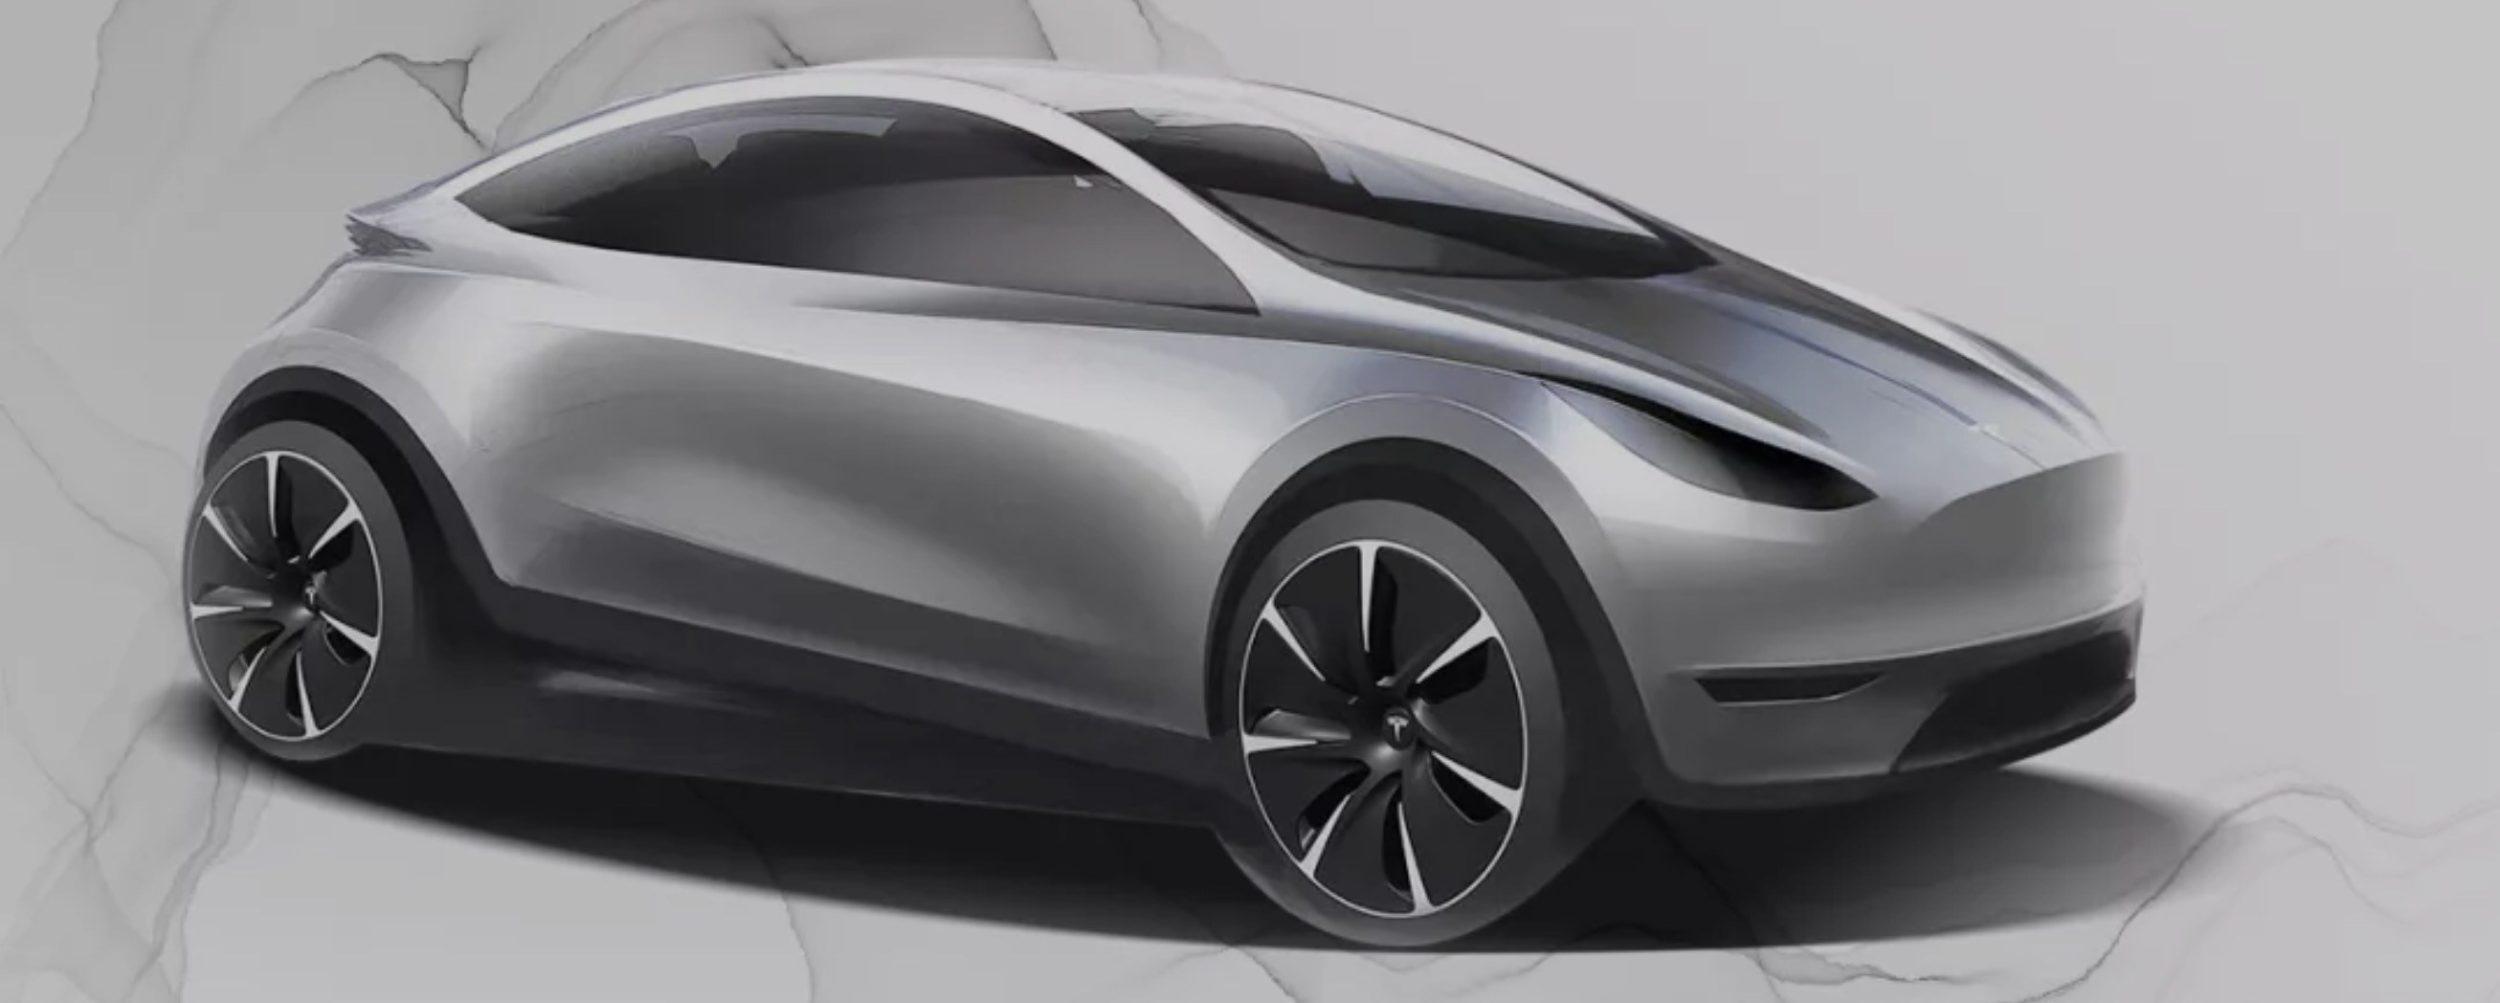 Tesla electric hatchback: Elon Musk says new car might be designed in  Germany - Electrek